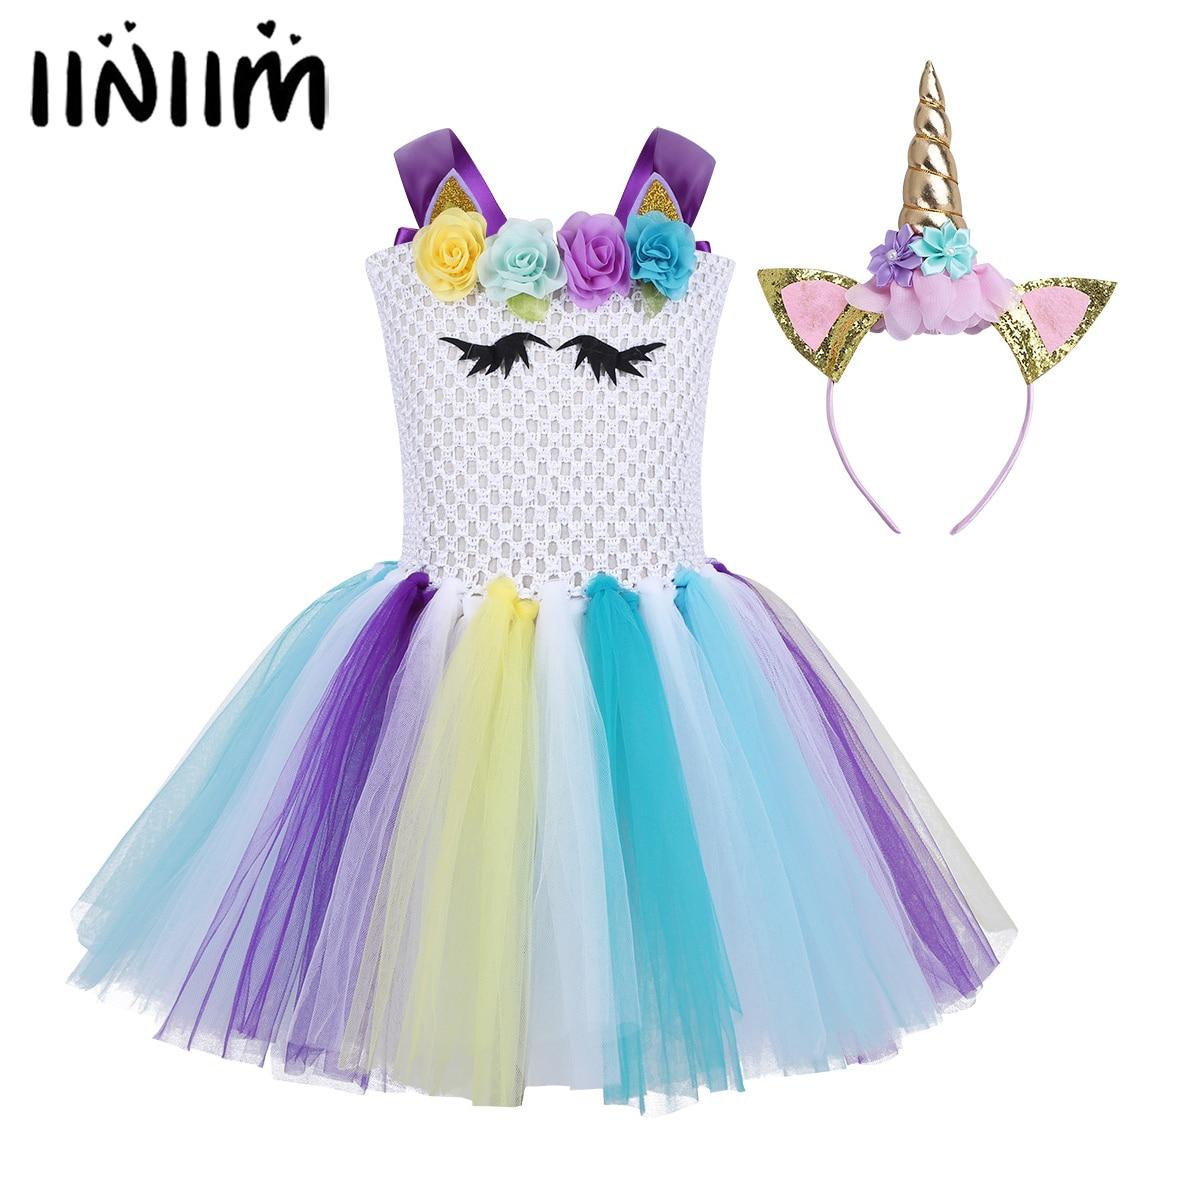 iiniim Children Girls Princess Cosplay Costumes Dress Halloween Costume for Kids Tutu Dress Up Fancy Party Carnival Clothing